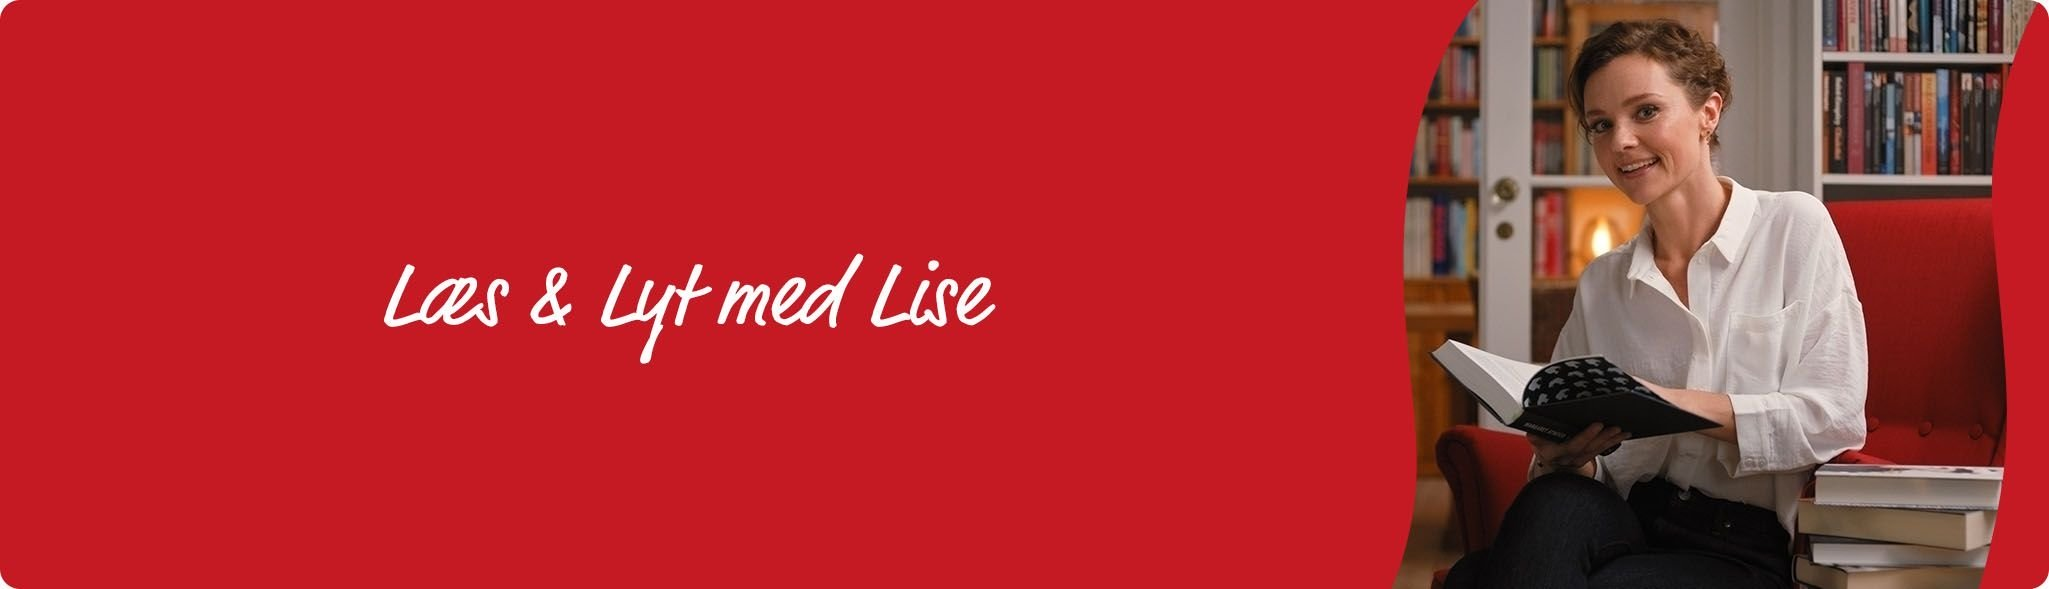 Læs og lyt med Lise - banner